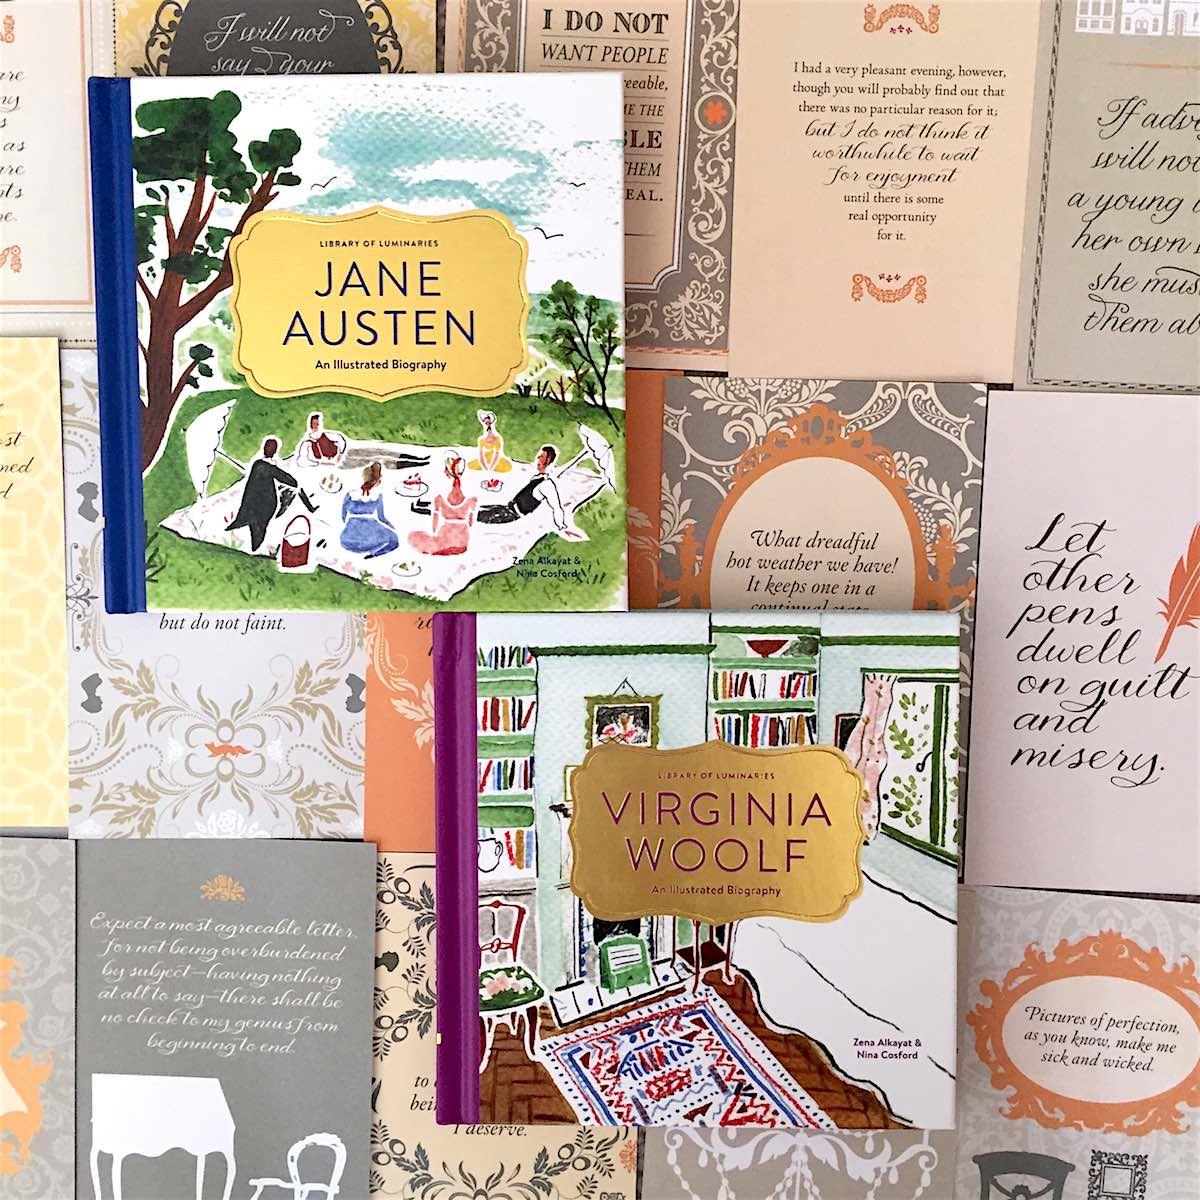 Bitesize Bio Series Launches With Jane Austen And Virginia Woolf